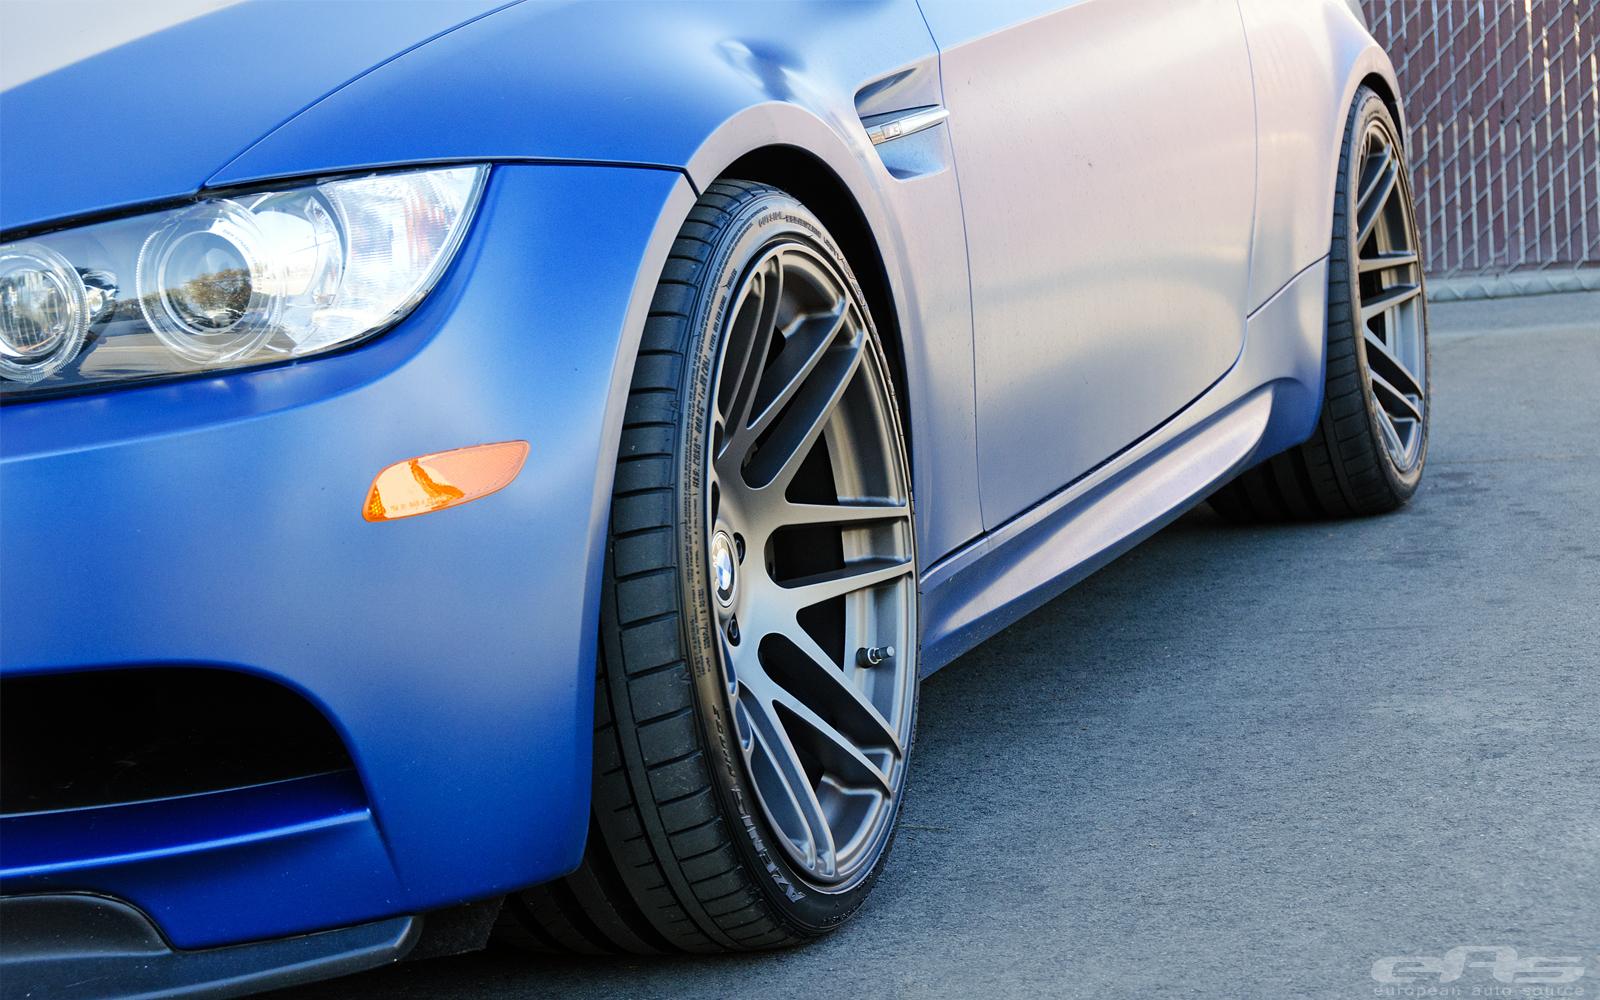 M240i needing new wheels - 2Addicts | BMW 2-Series forum